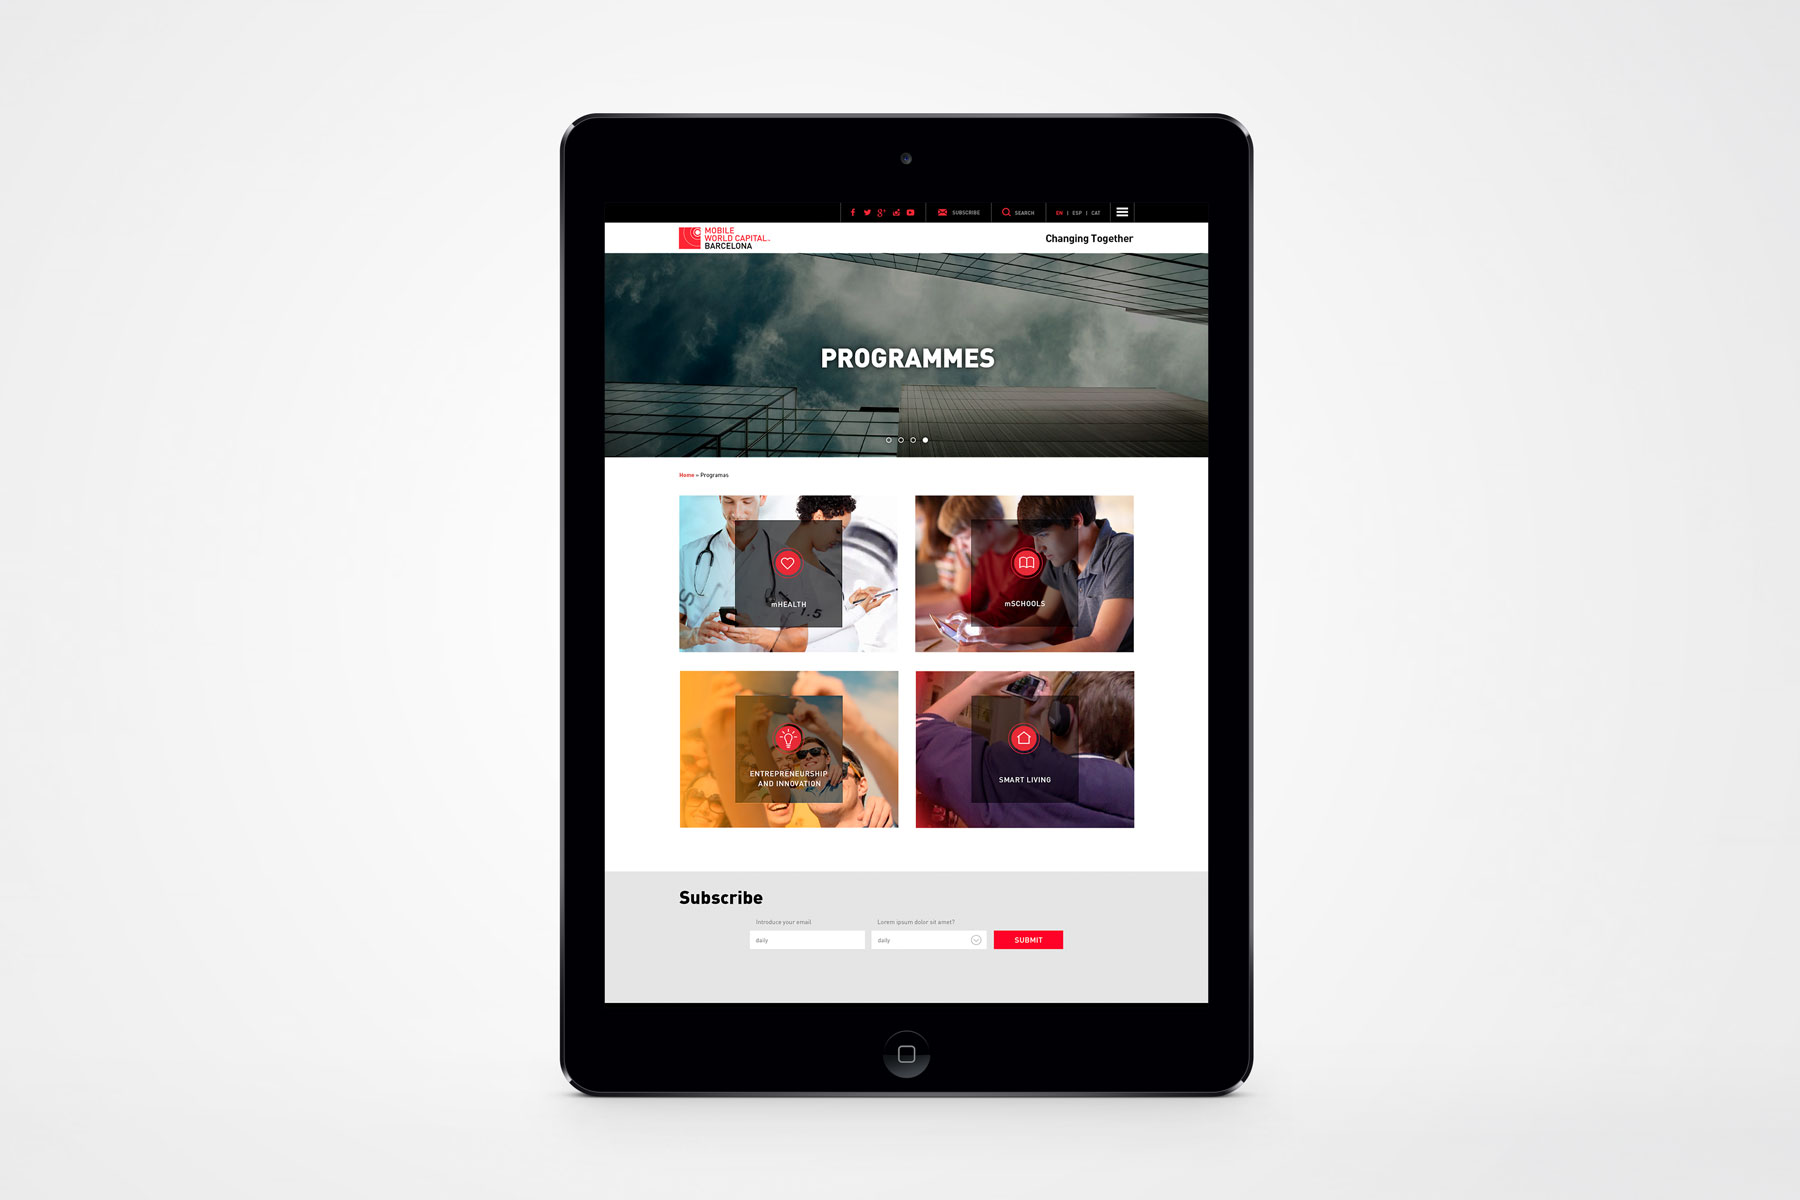 MWC-iPad2